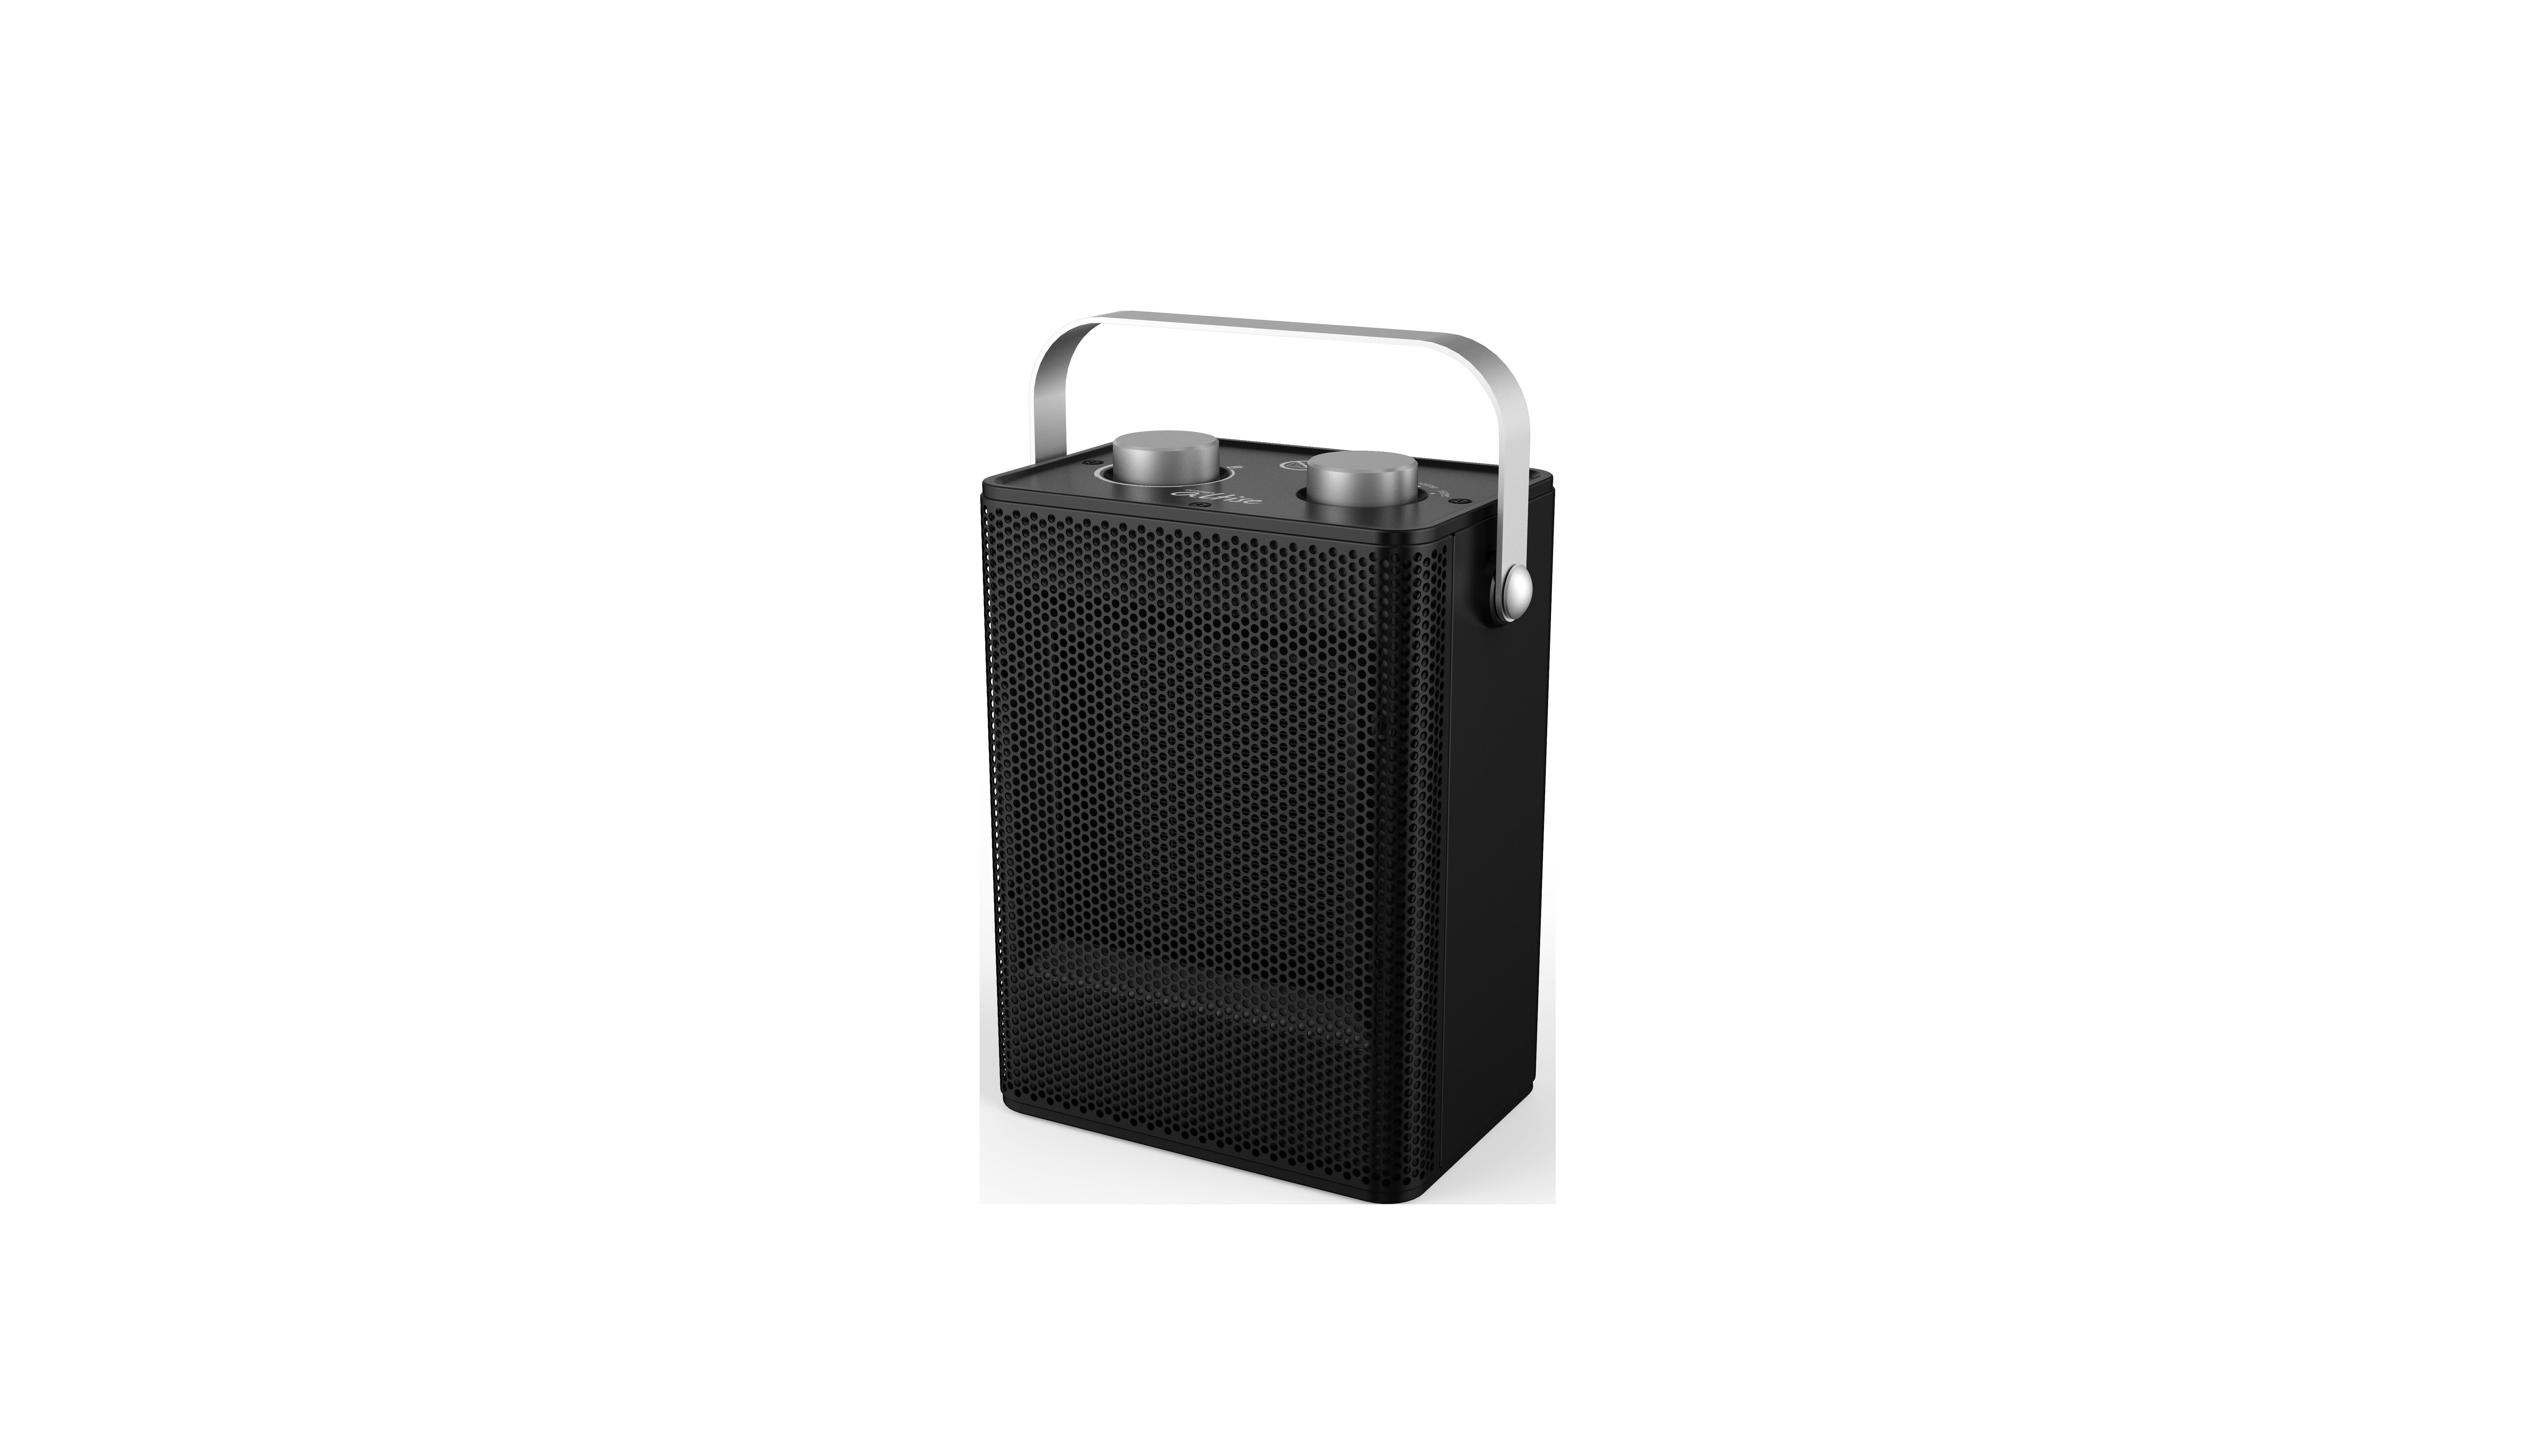 Omega Altise product Portable Ceramic Heater - BlackOACHM15B